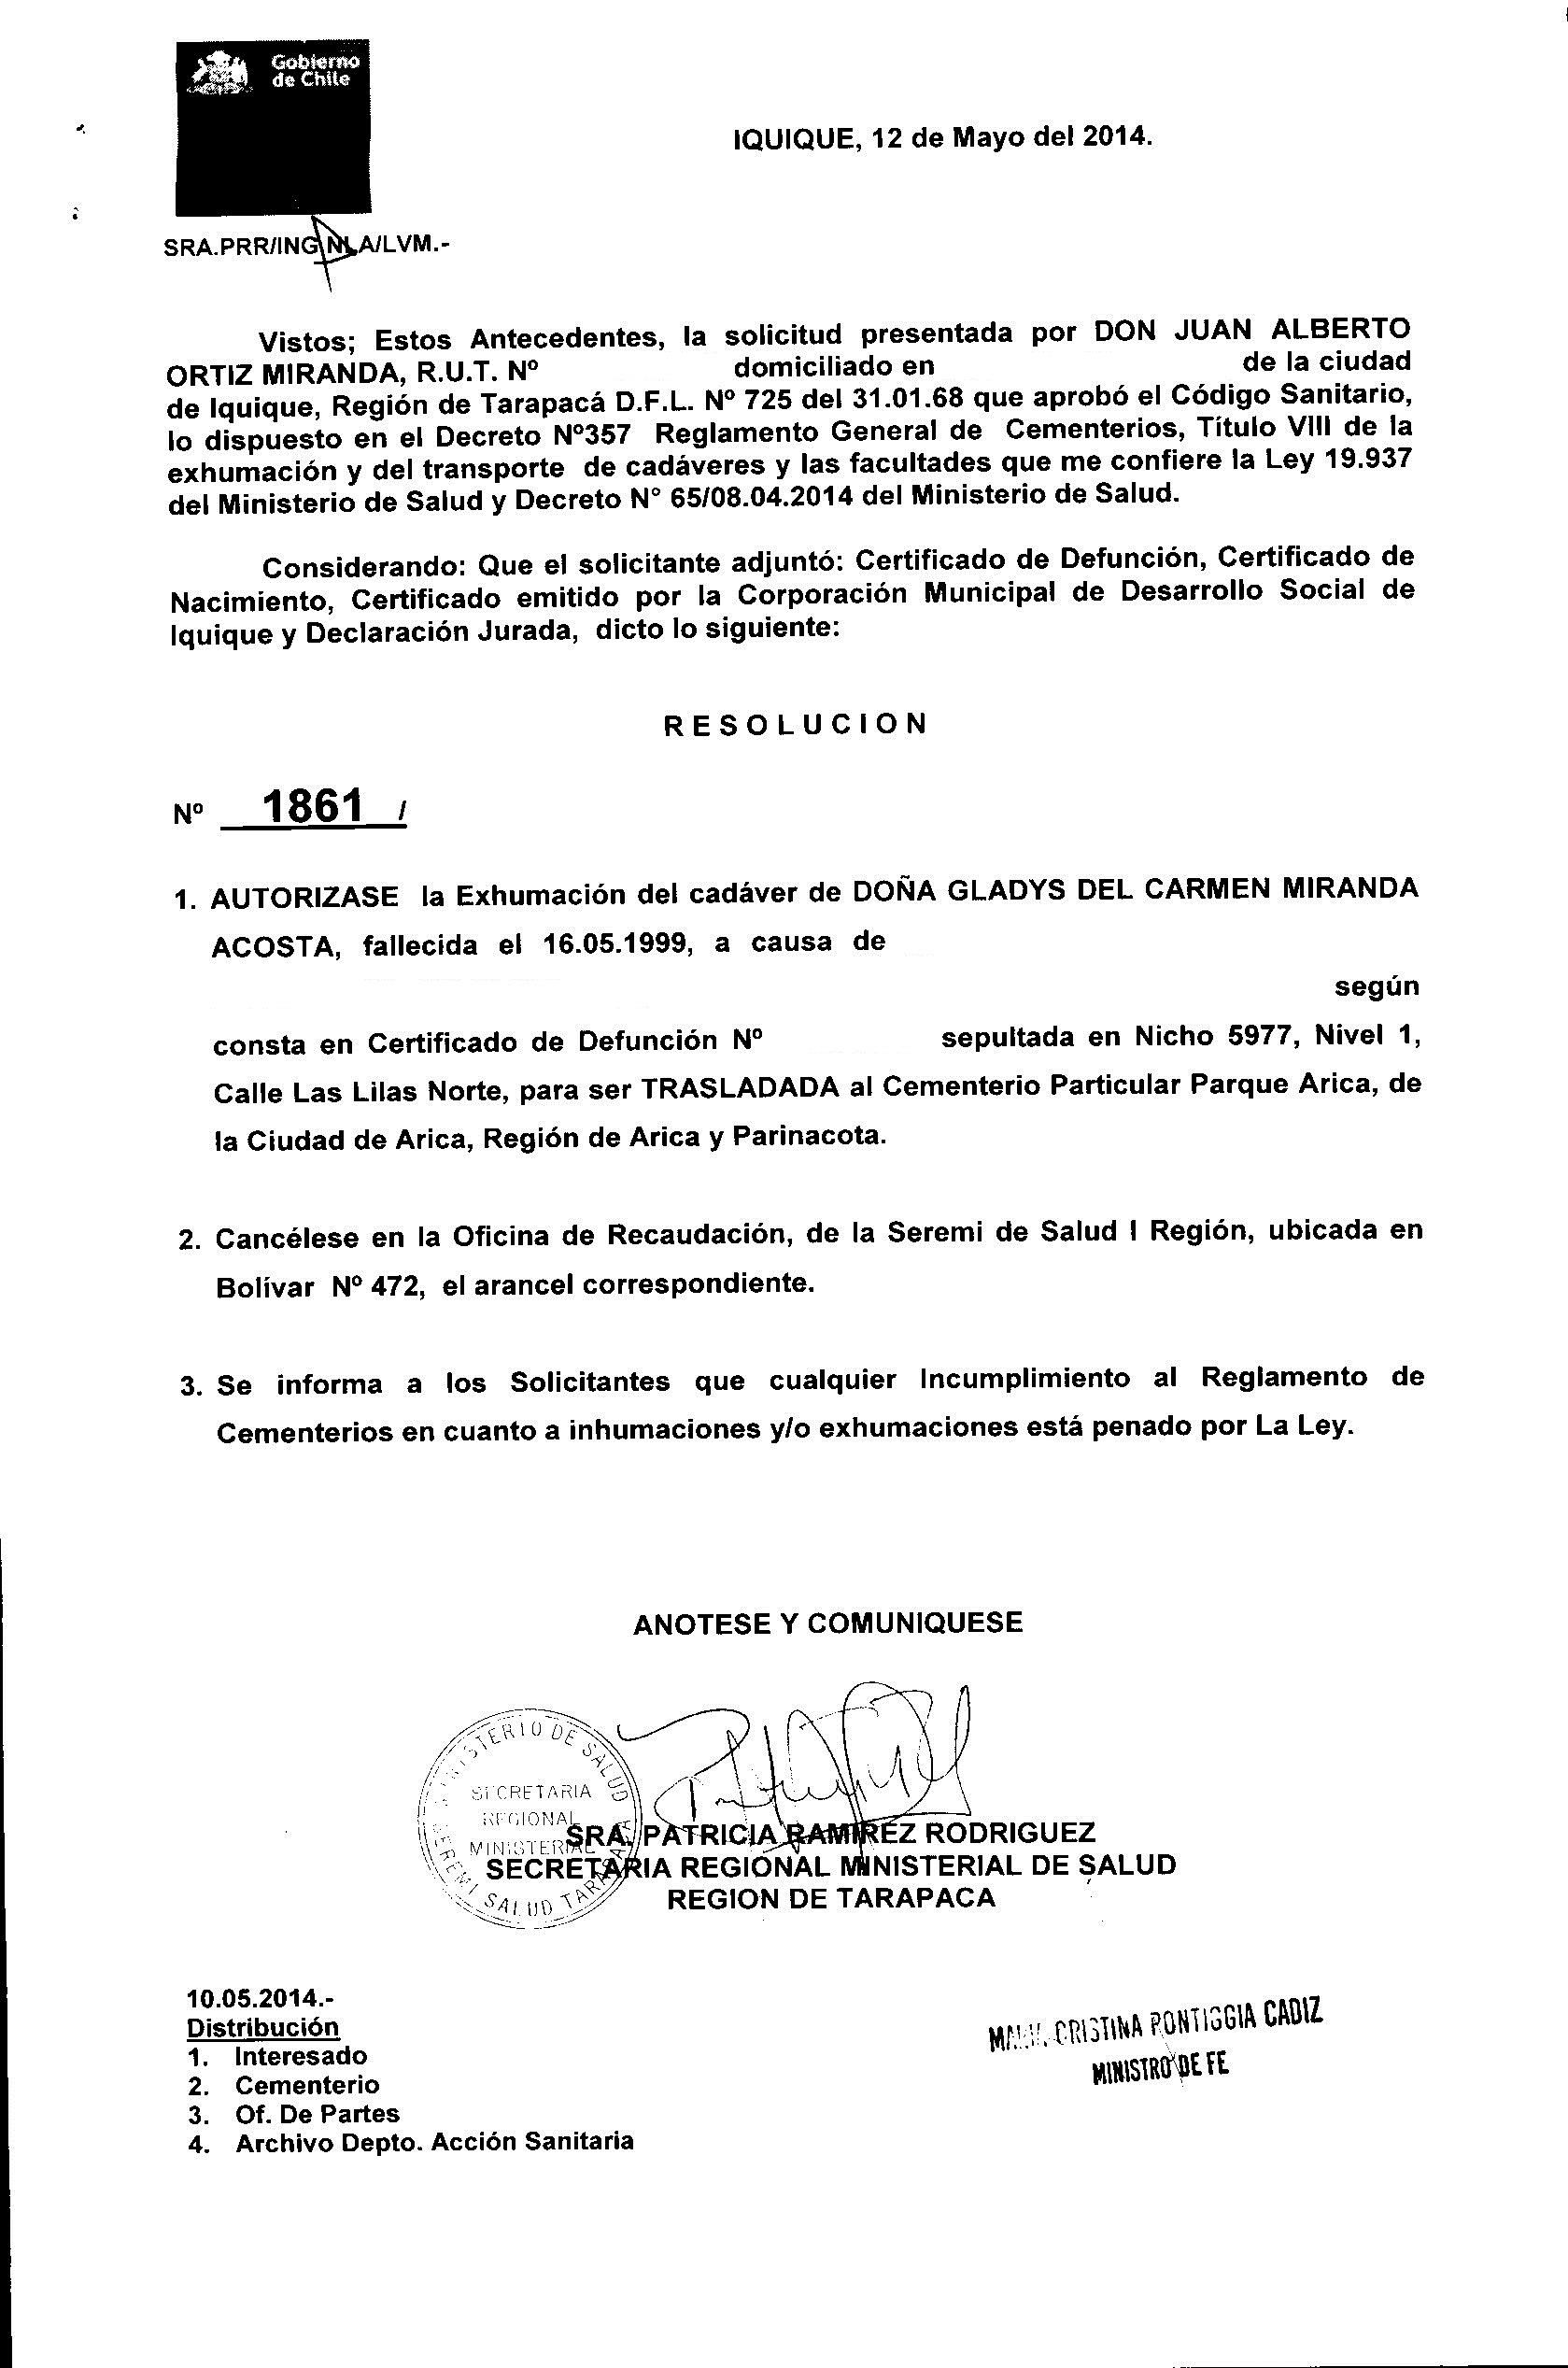 Increíble Vellore Corporación Municipal Certificado De Nacimiento En ...